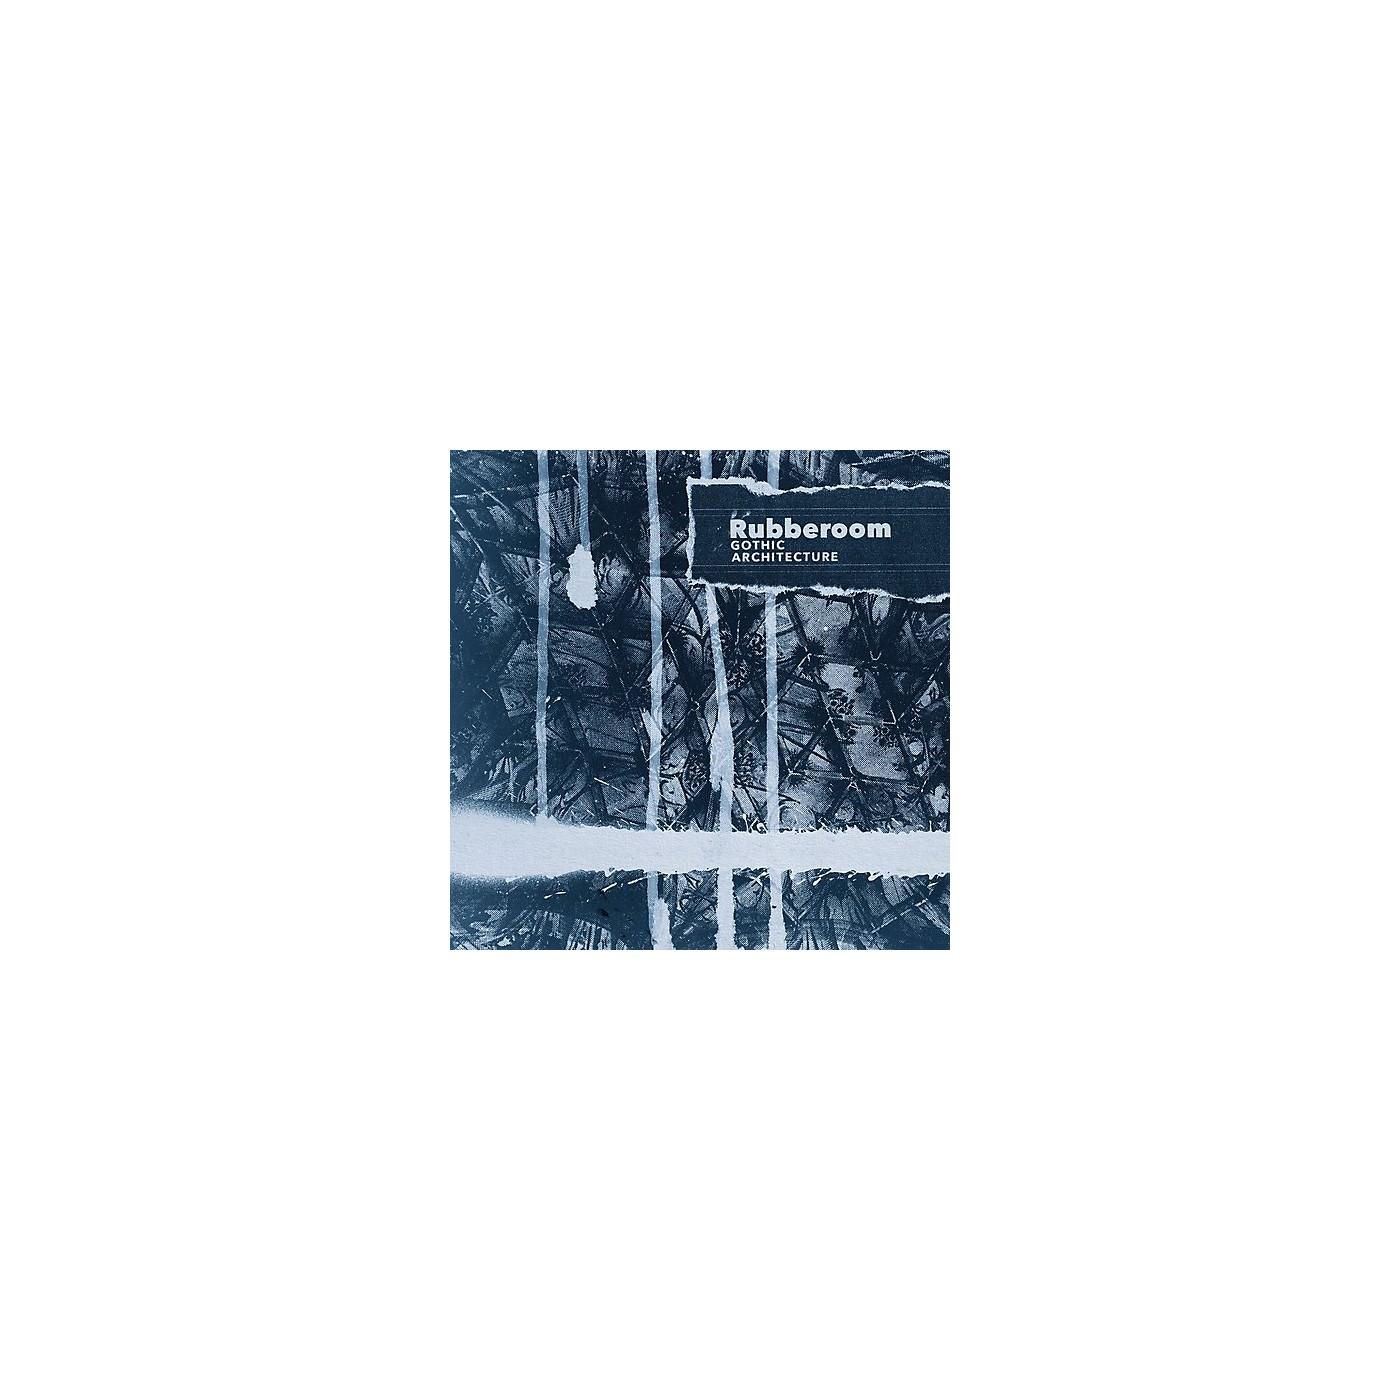 Alliance Rubberoom - Gothic Architecture thumbnail